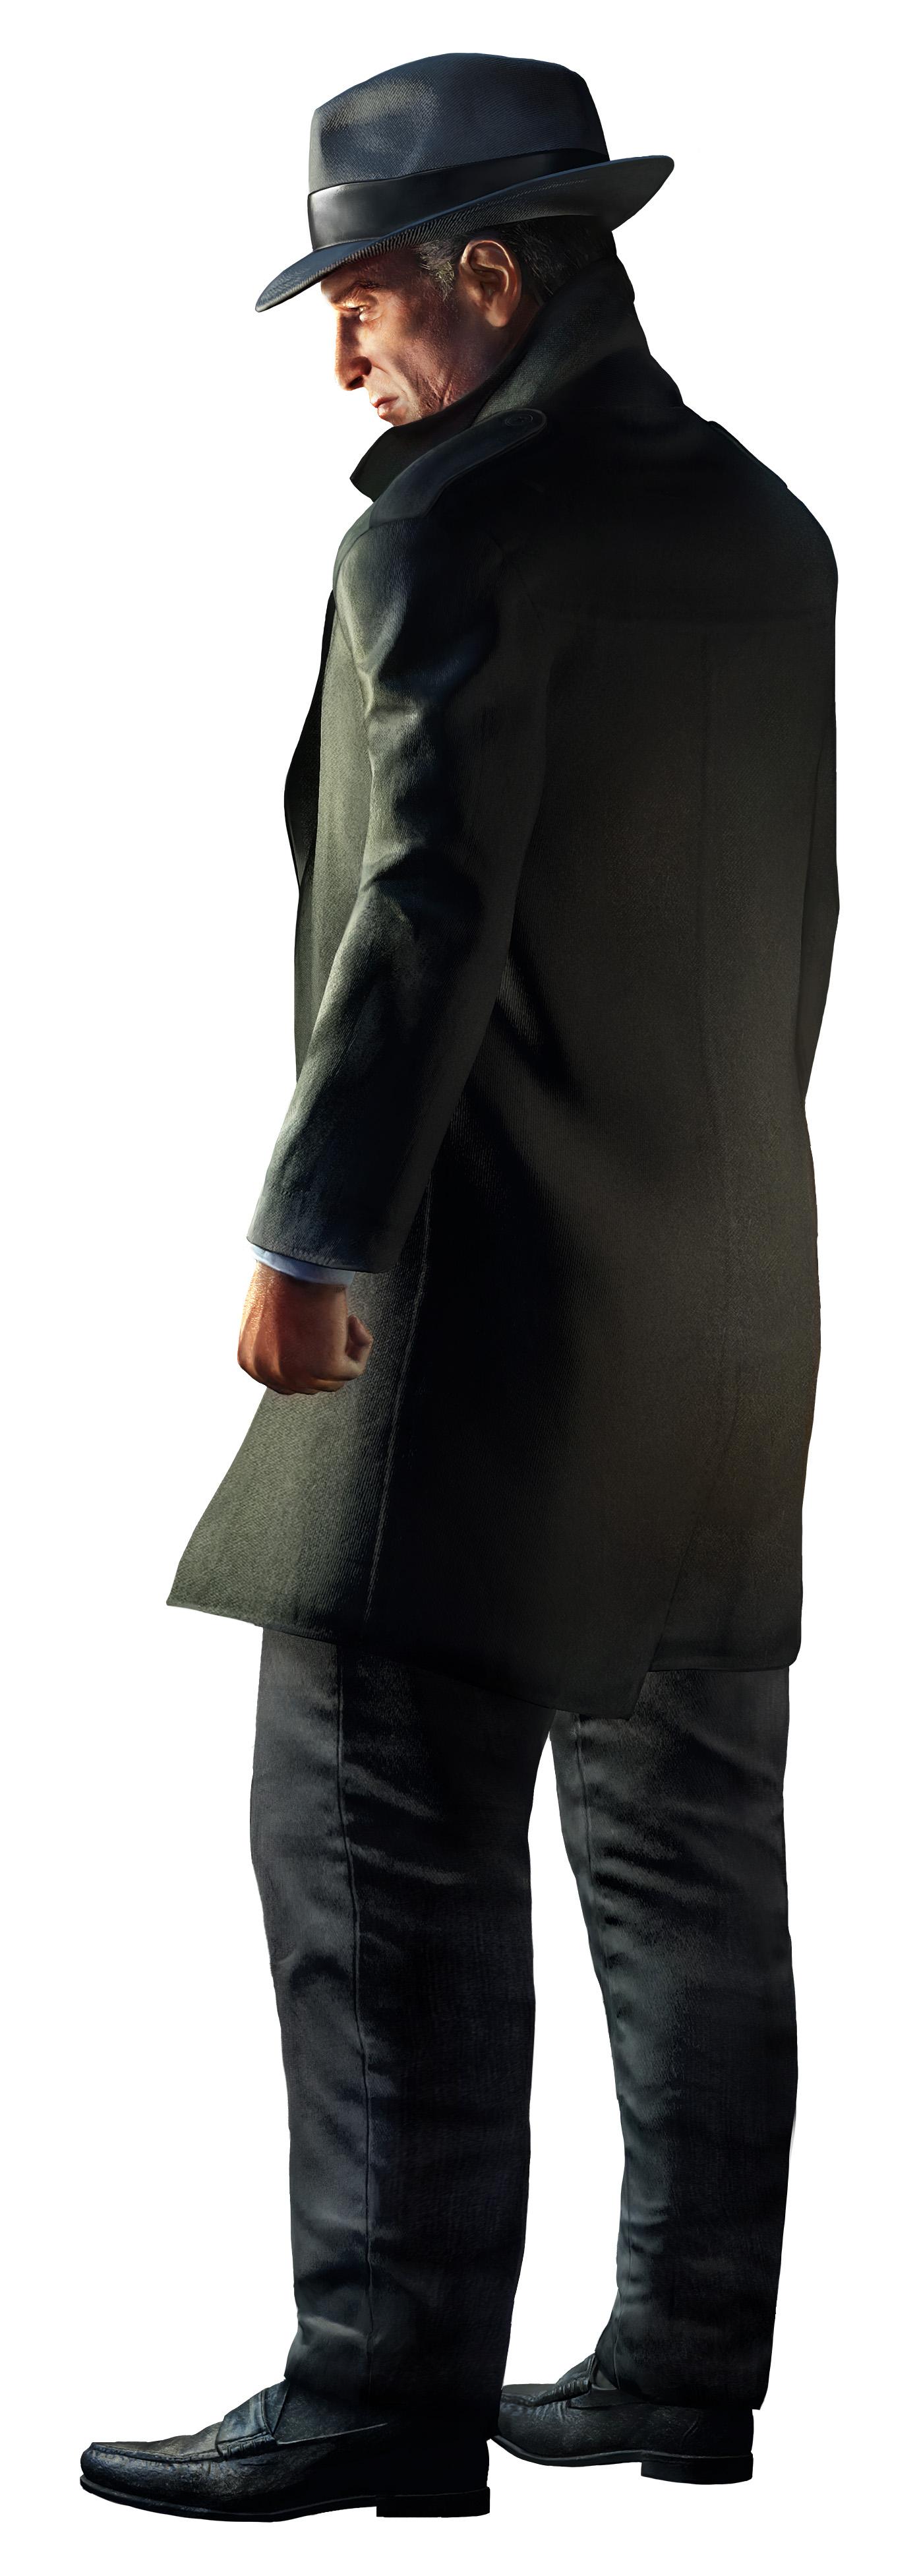 Mafia 3 render - Vito